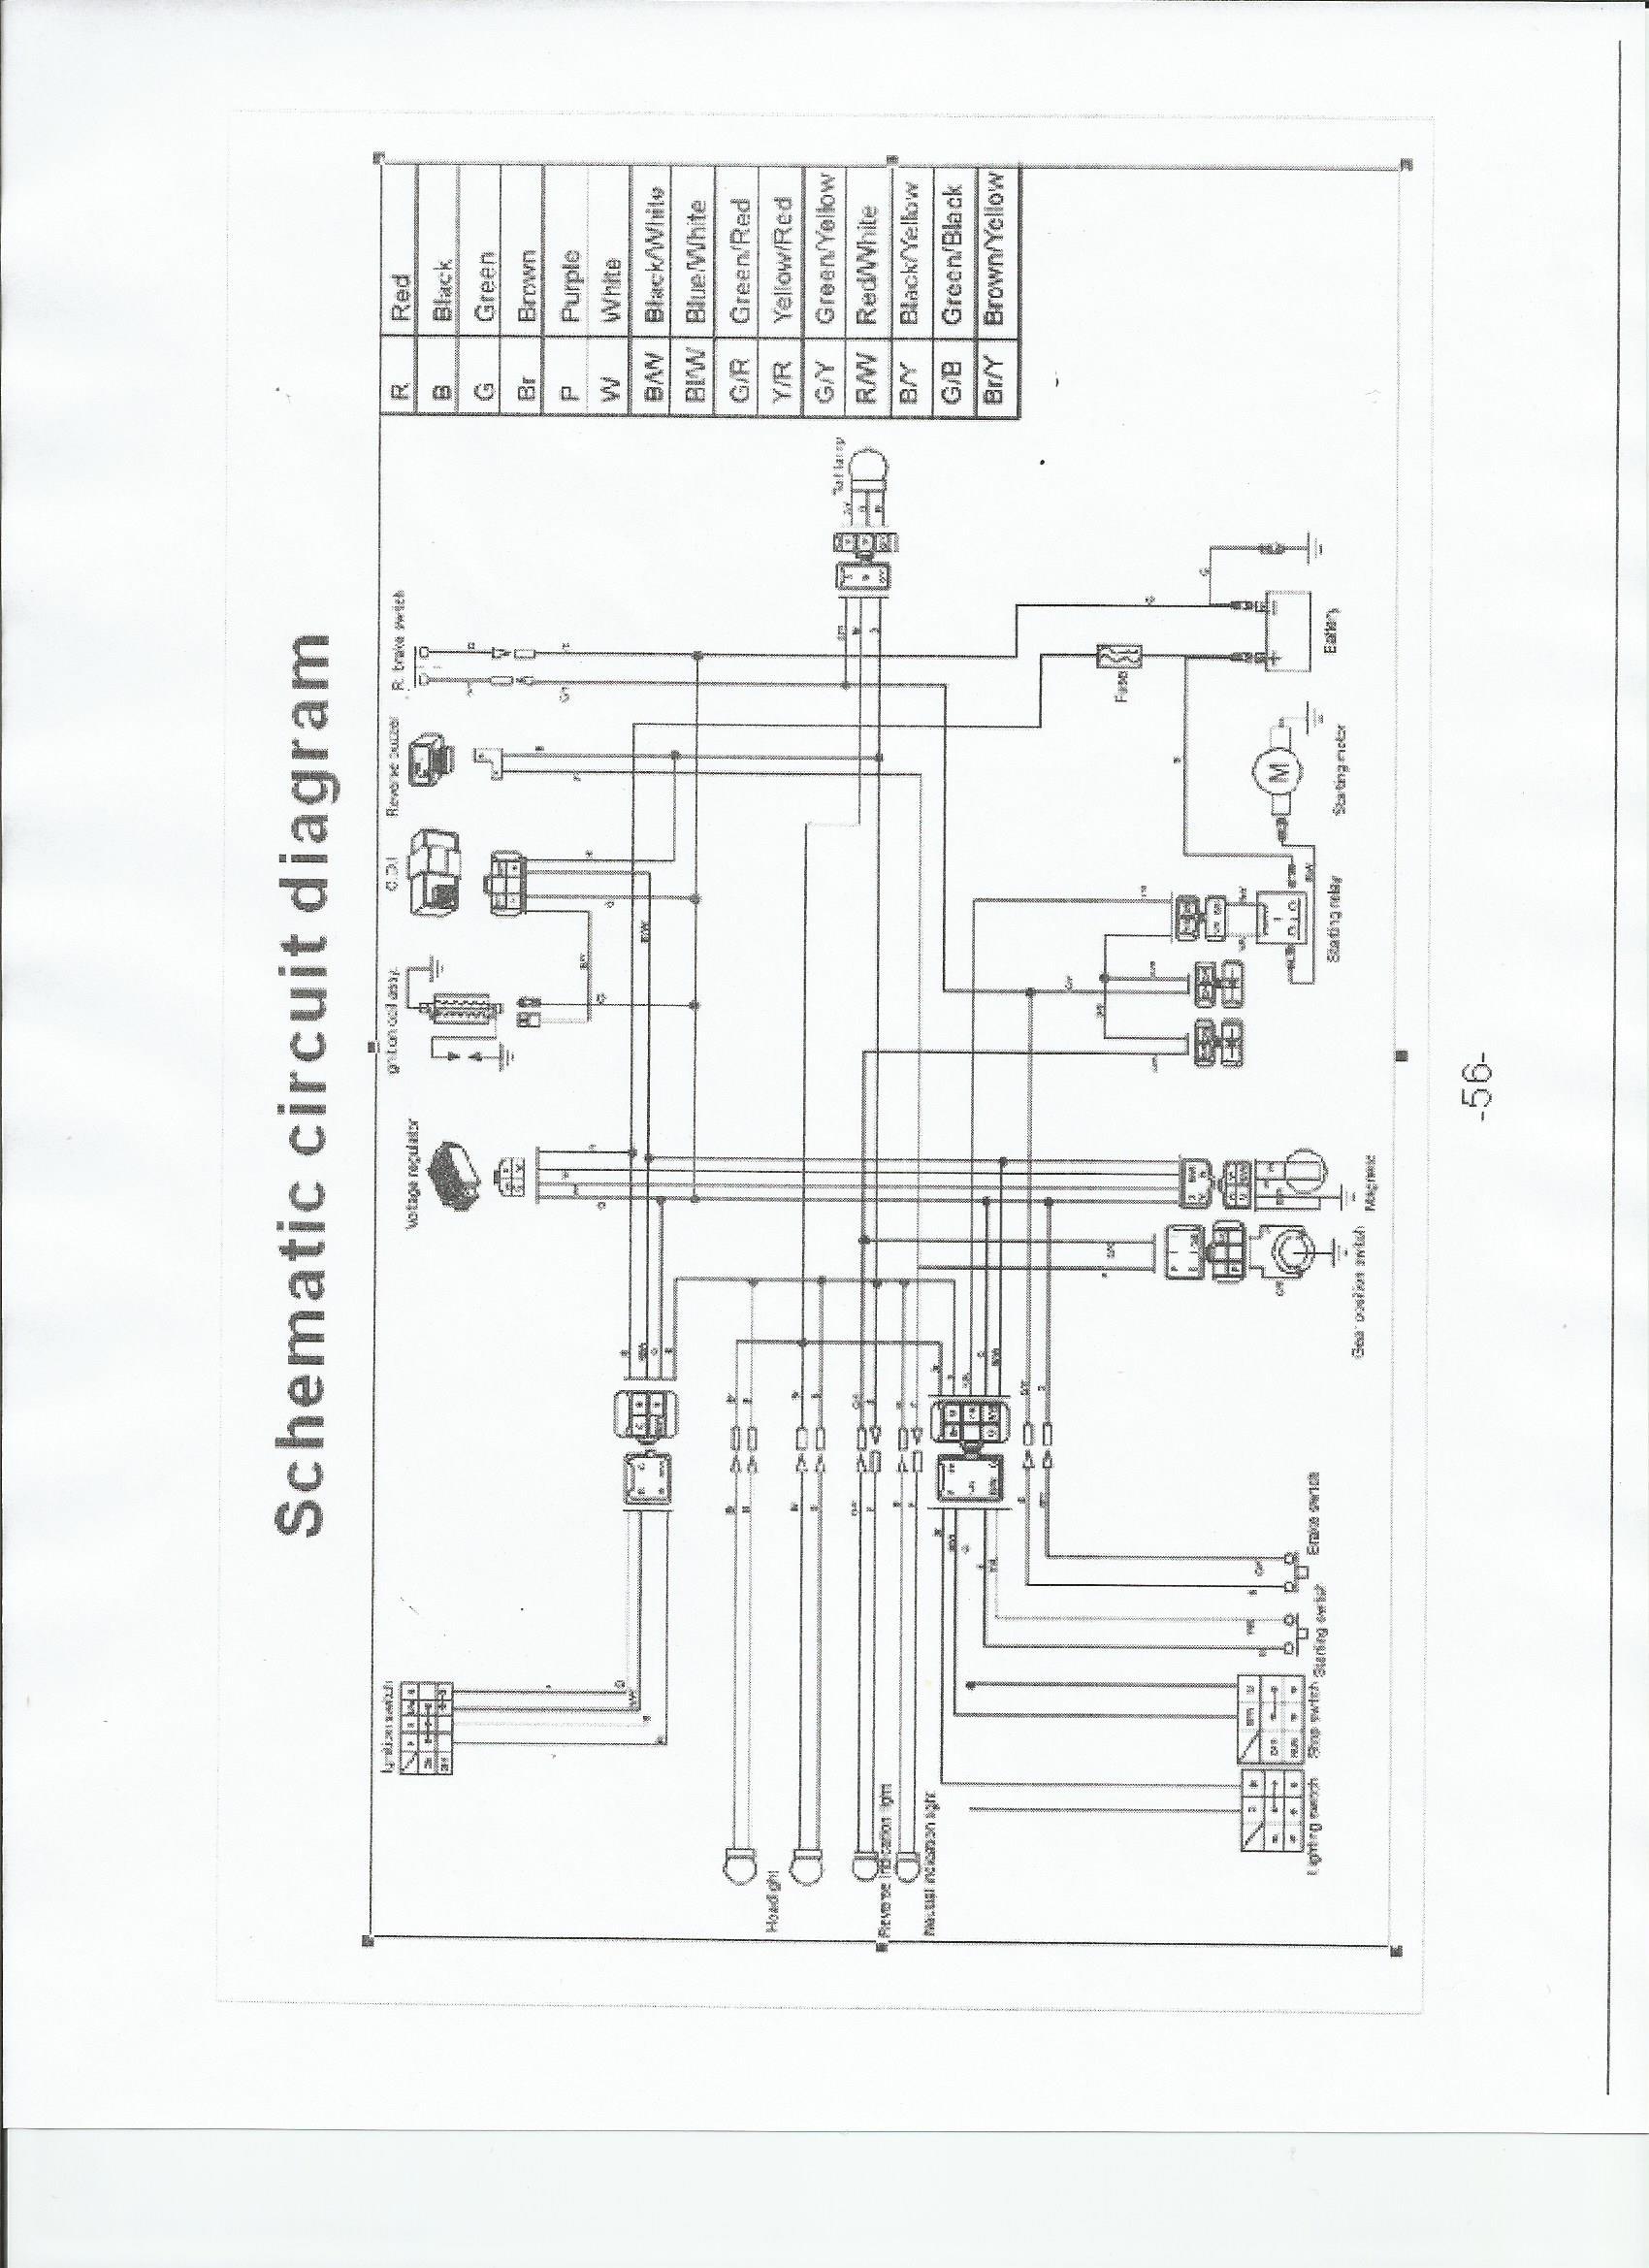 zhejiang atv wiring diagram